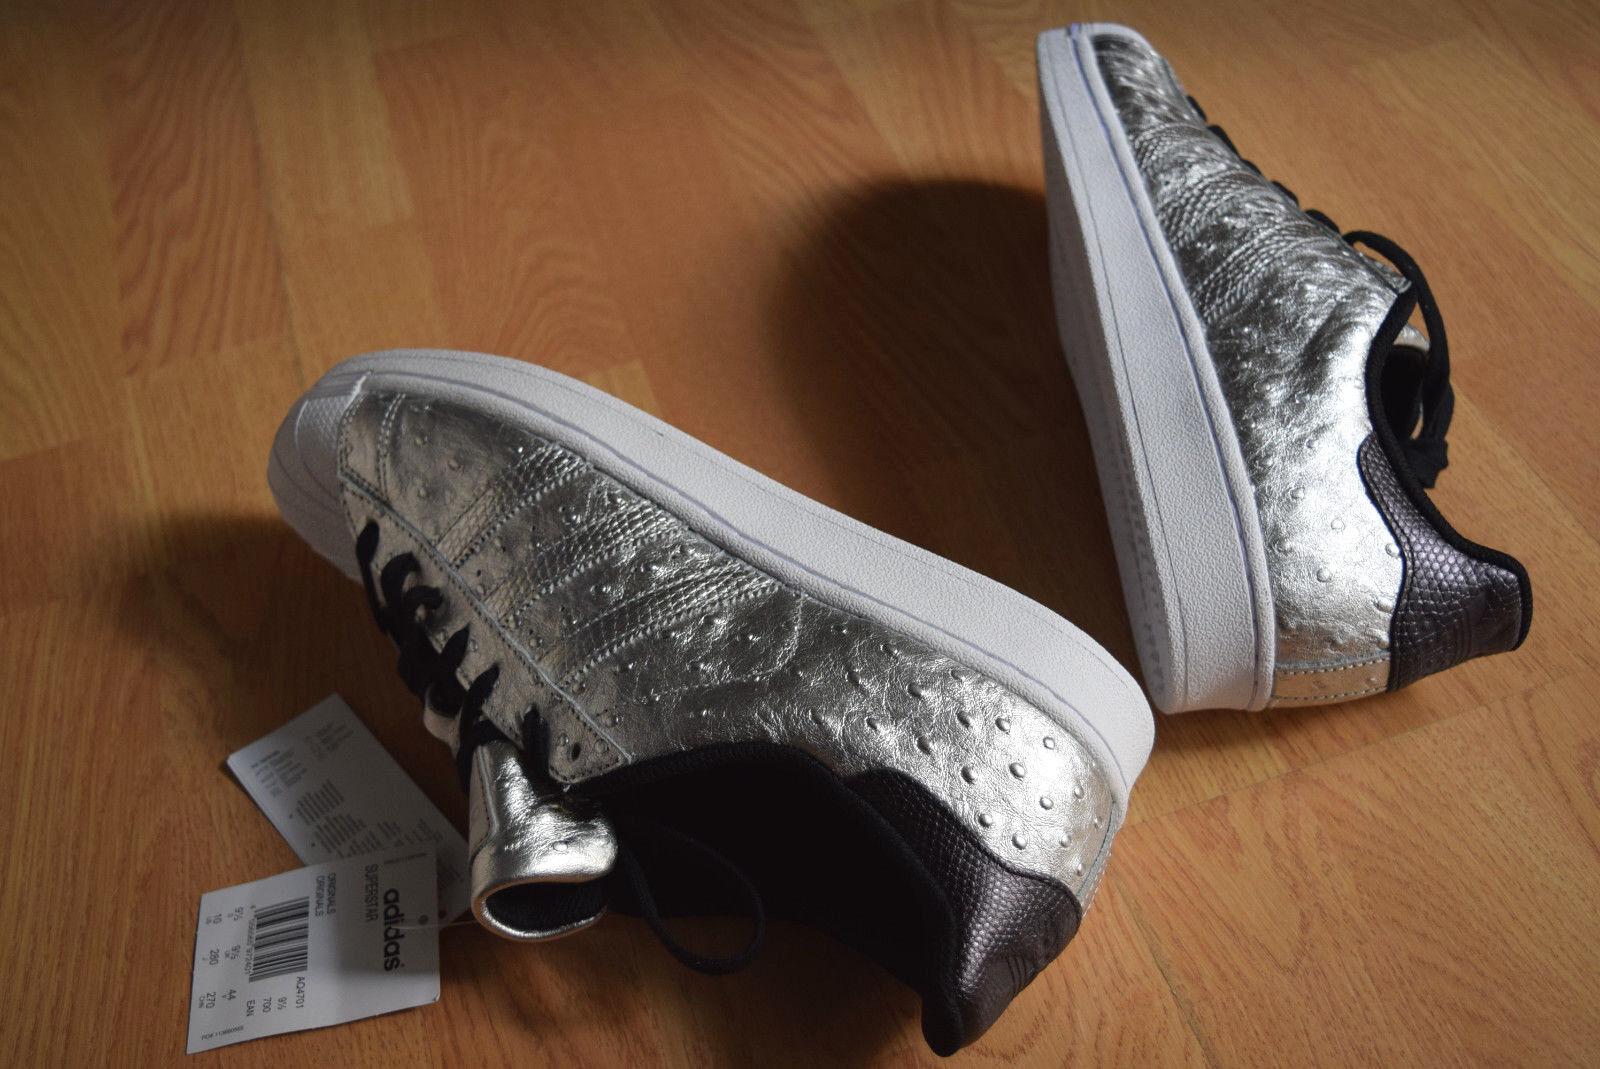 Adidas Superstar 80s  40 41 AQ4701 42 43 44  AQ4701 41 cAmPuS sTan smitH 80's grand slaM 66d0d9